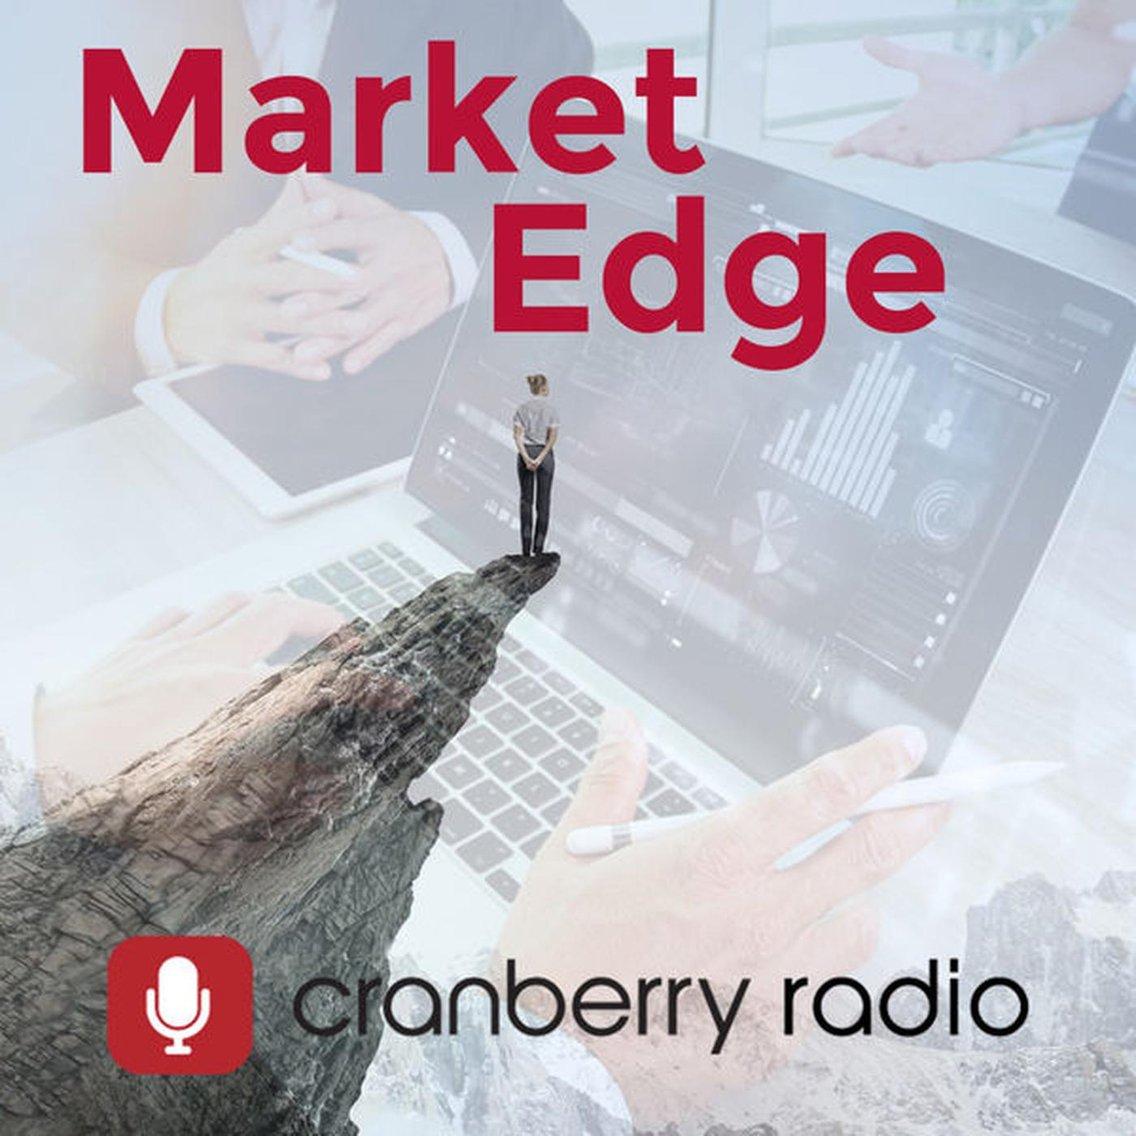 Market Edge with Larry Weber - imagen de portada